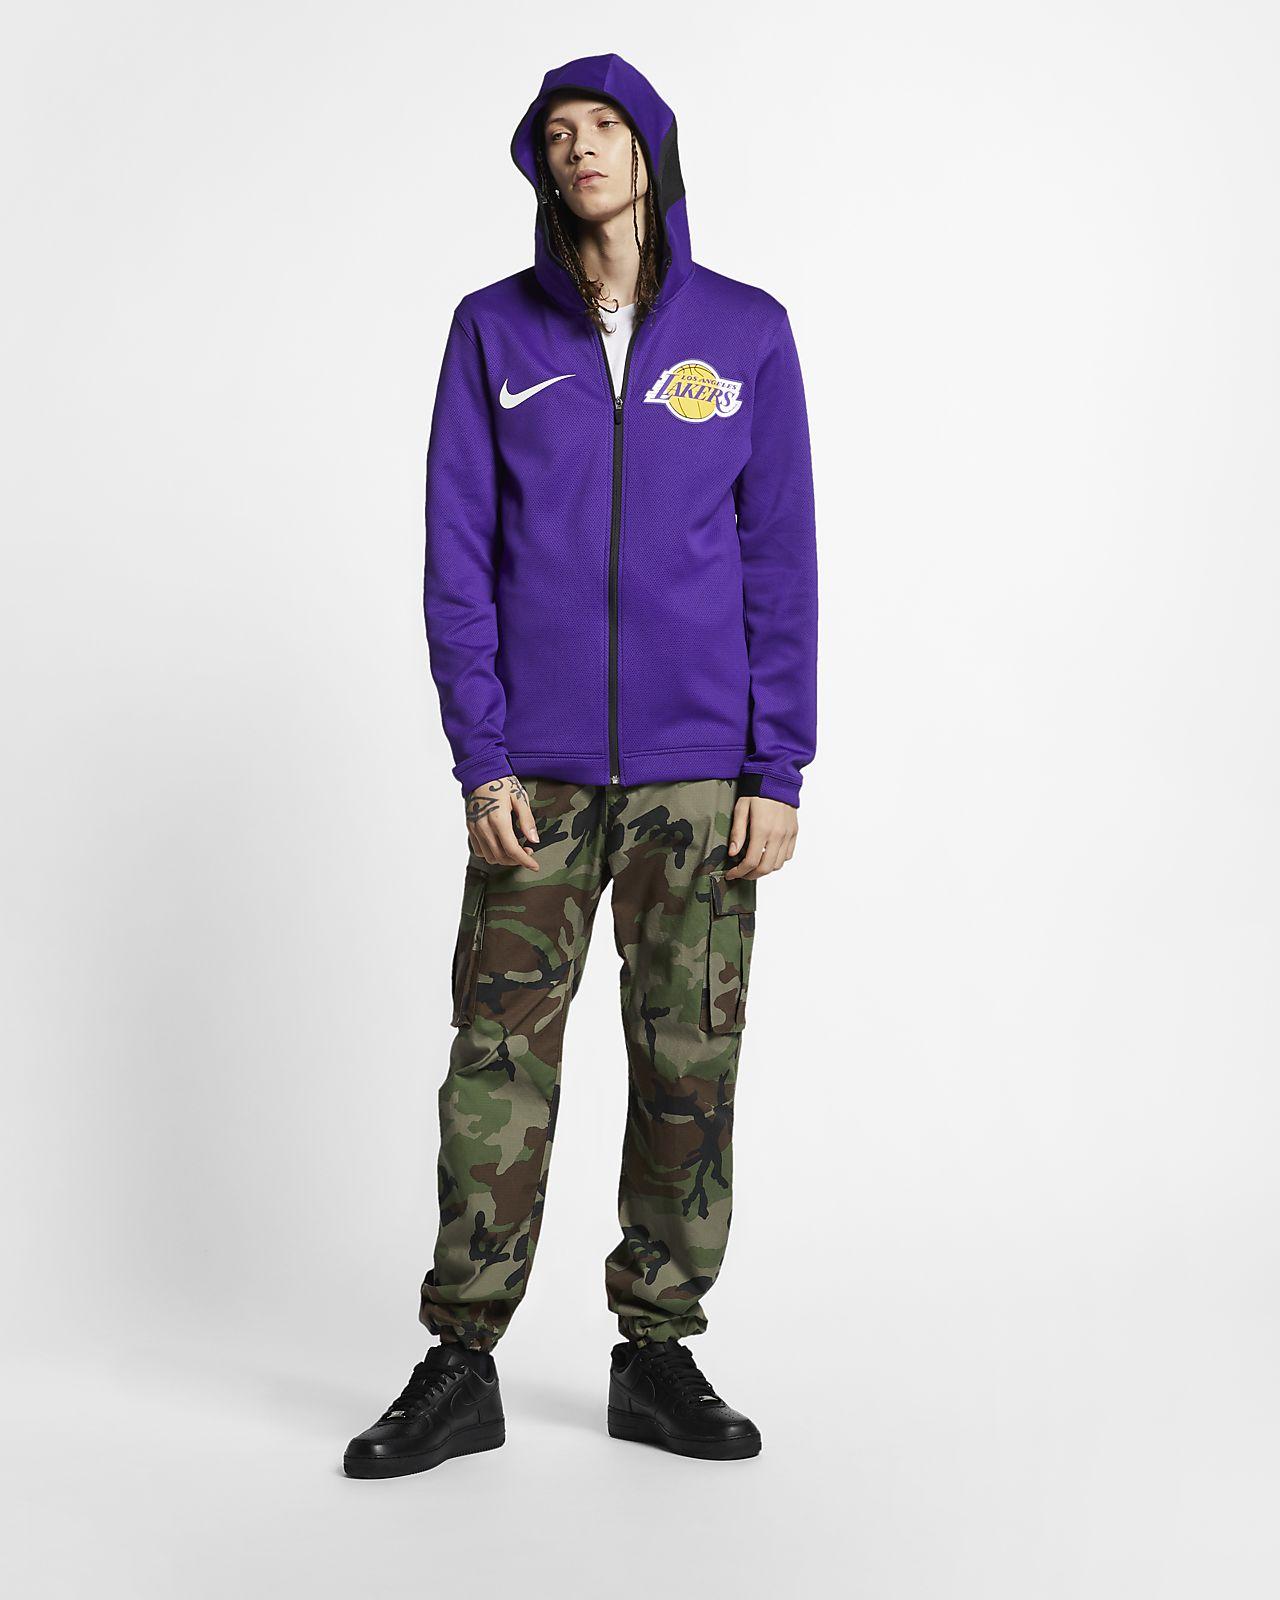 6fe4b12c Los Angeles Lakers Nike Therma Flex Showtime Men's NBA Hoodie. Nike ...